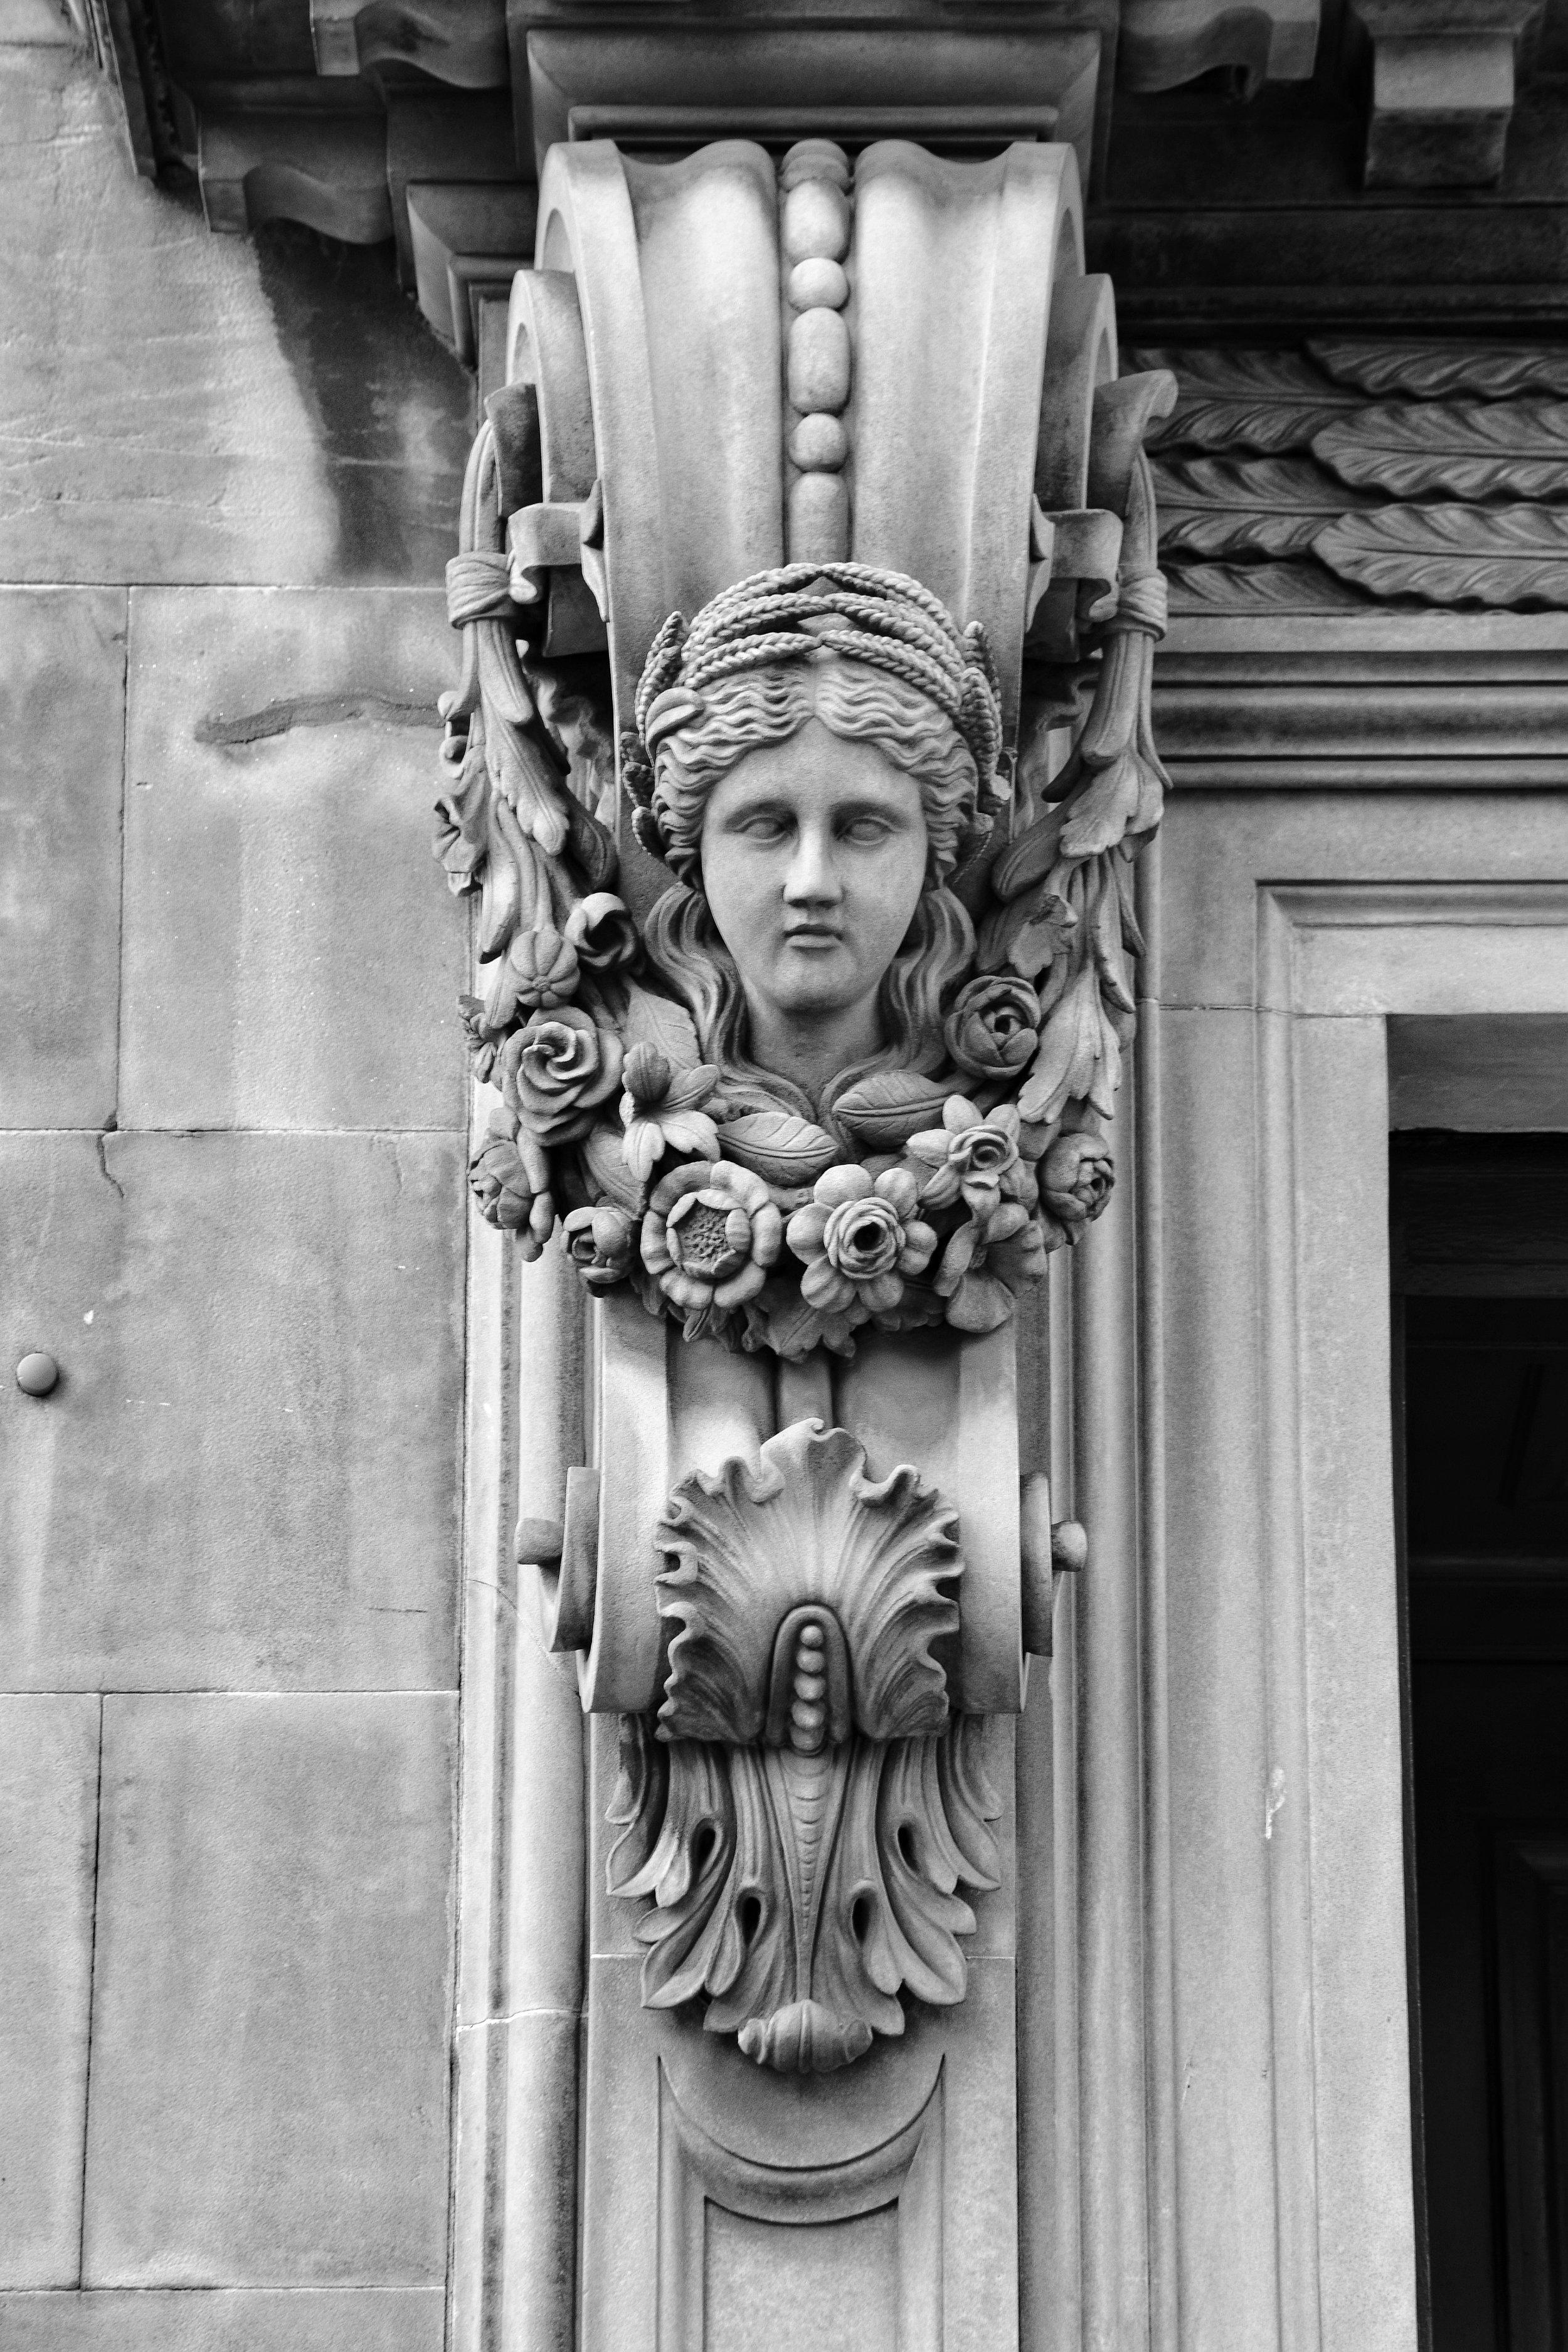 The Stone Lady (The Royal Mile, Edinburgh, Scotland)